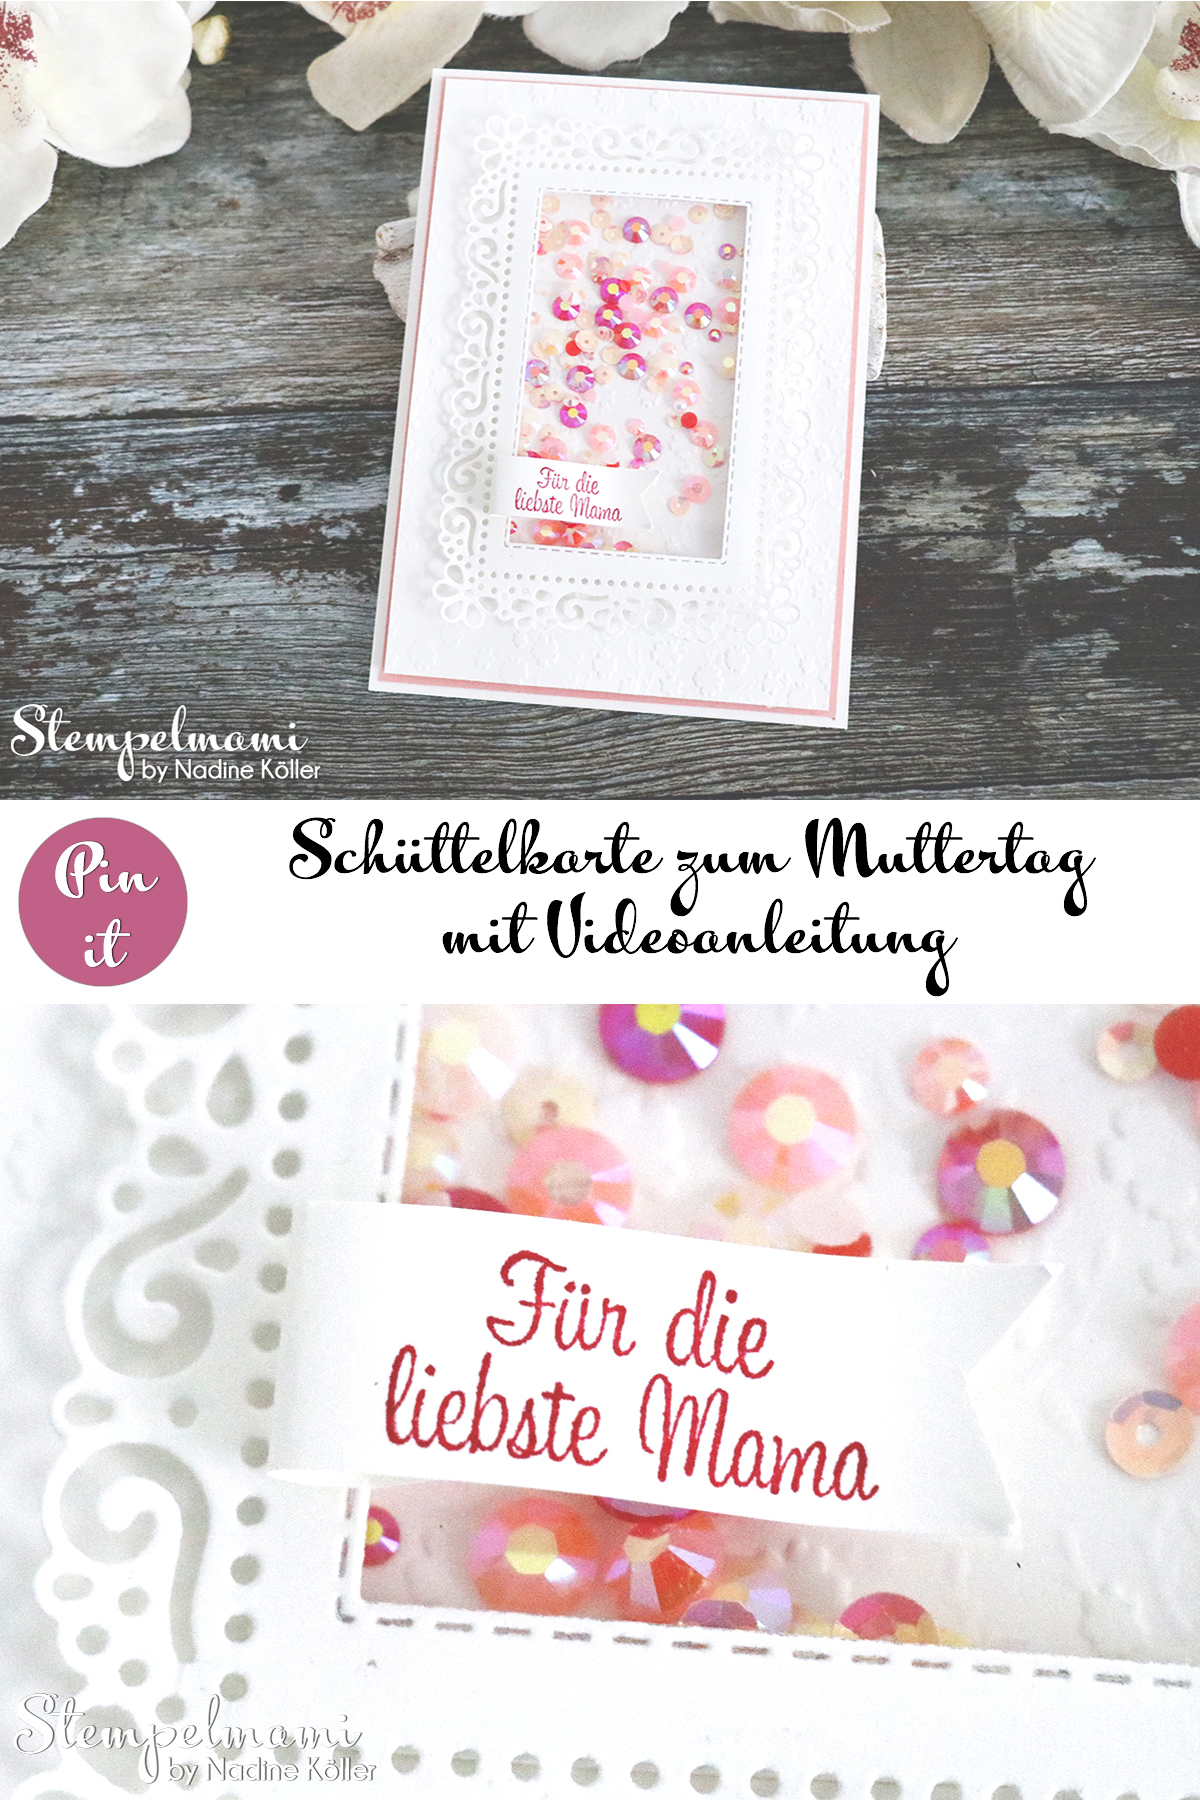 Stampin Up Anleitung Schuettelkarte zum Muttertag Shakerkarte Shakercard to Motherday Stempelmami Videoanleitung Youtube Pinterest